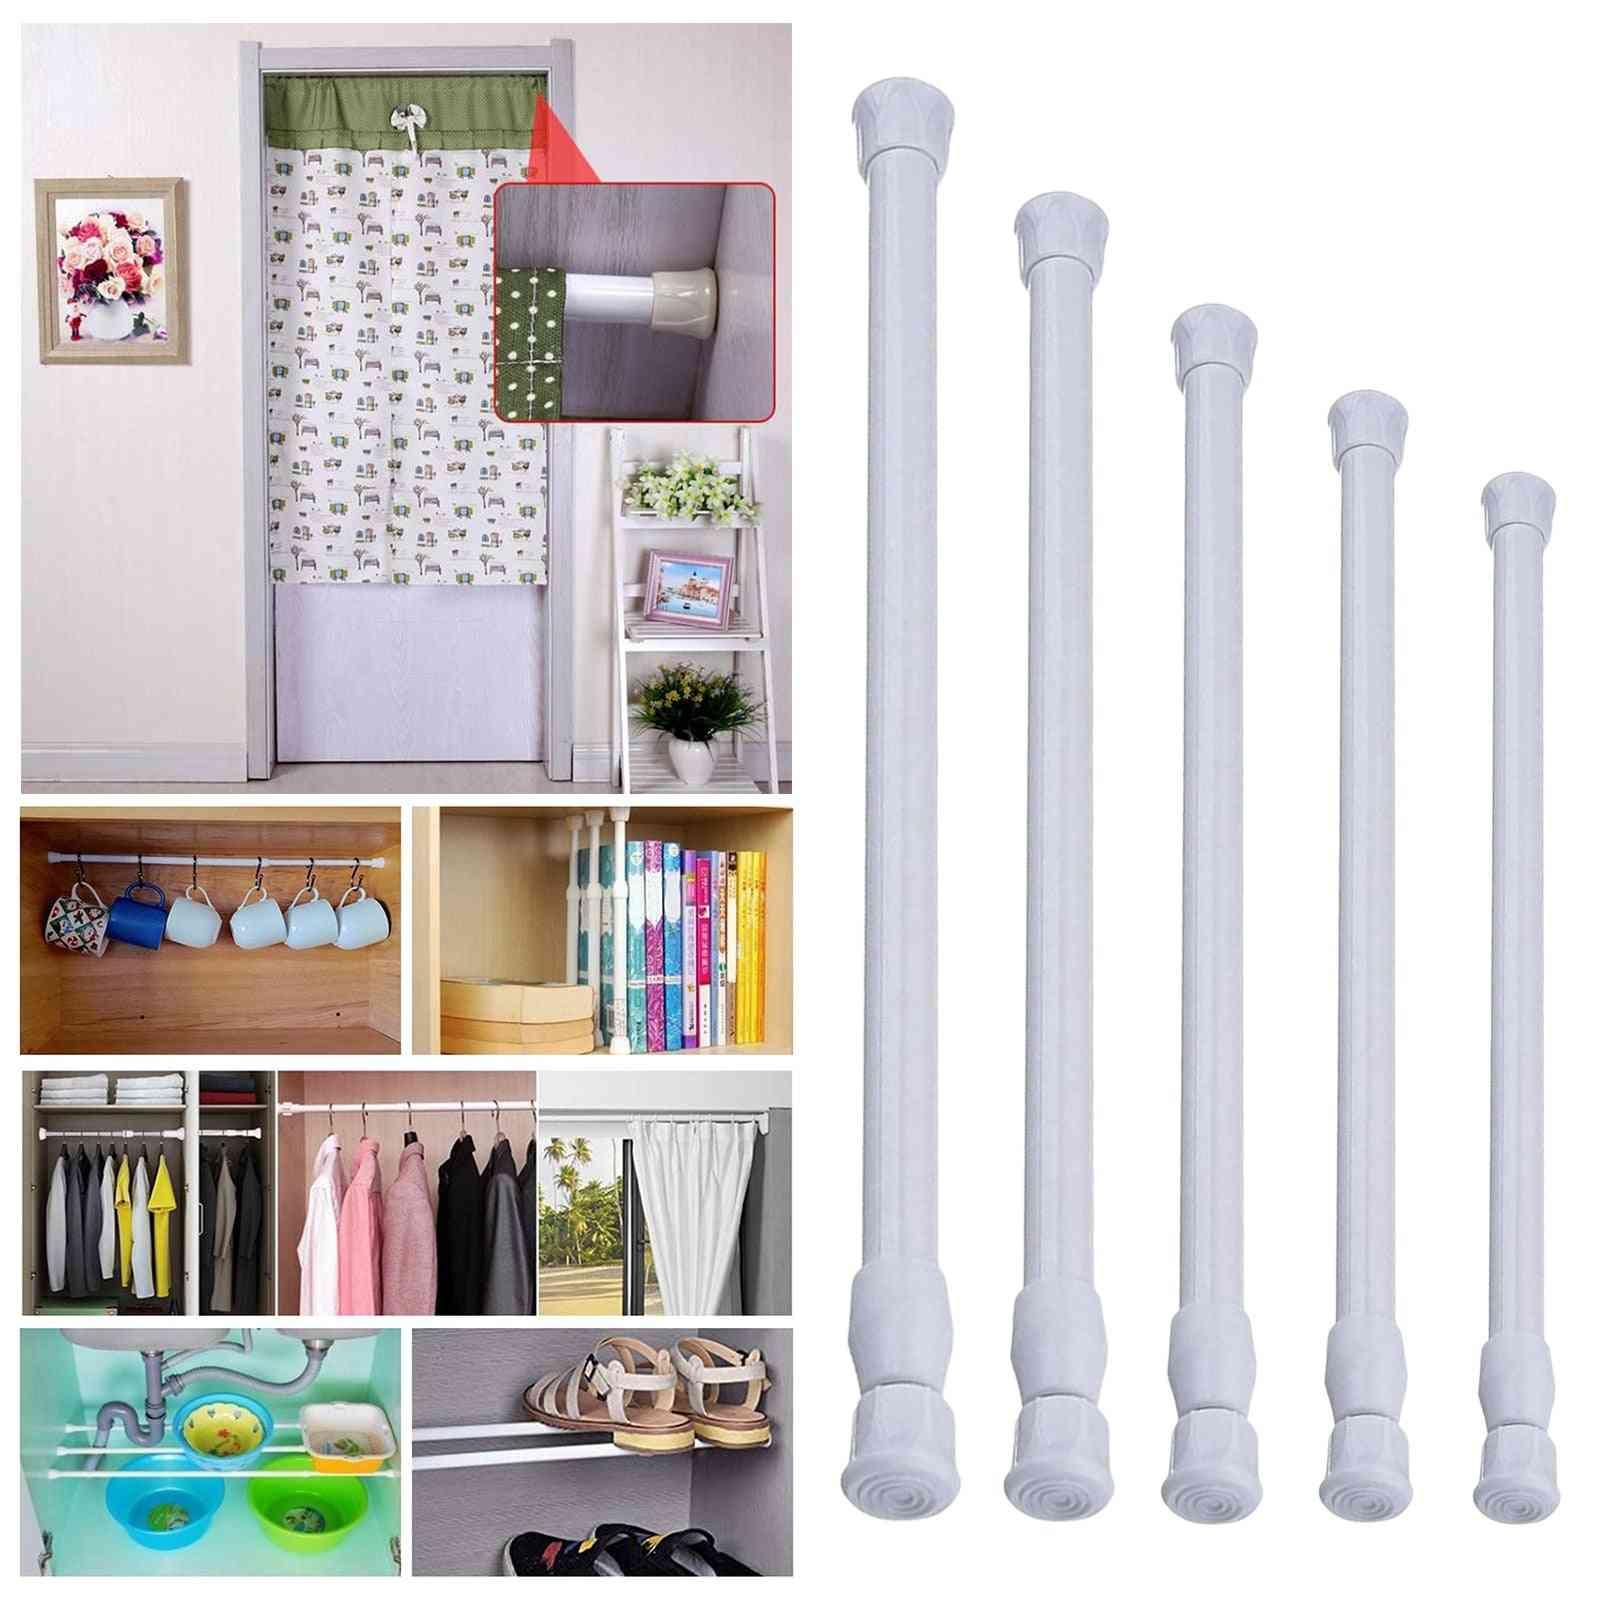 Spring Curtain Short Tension Bar Hanger Rods